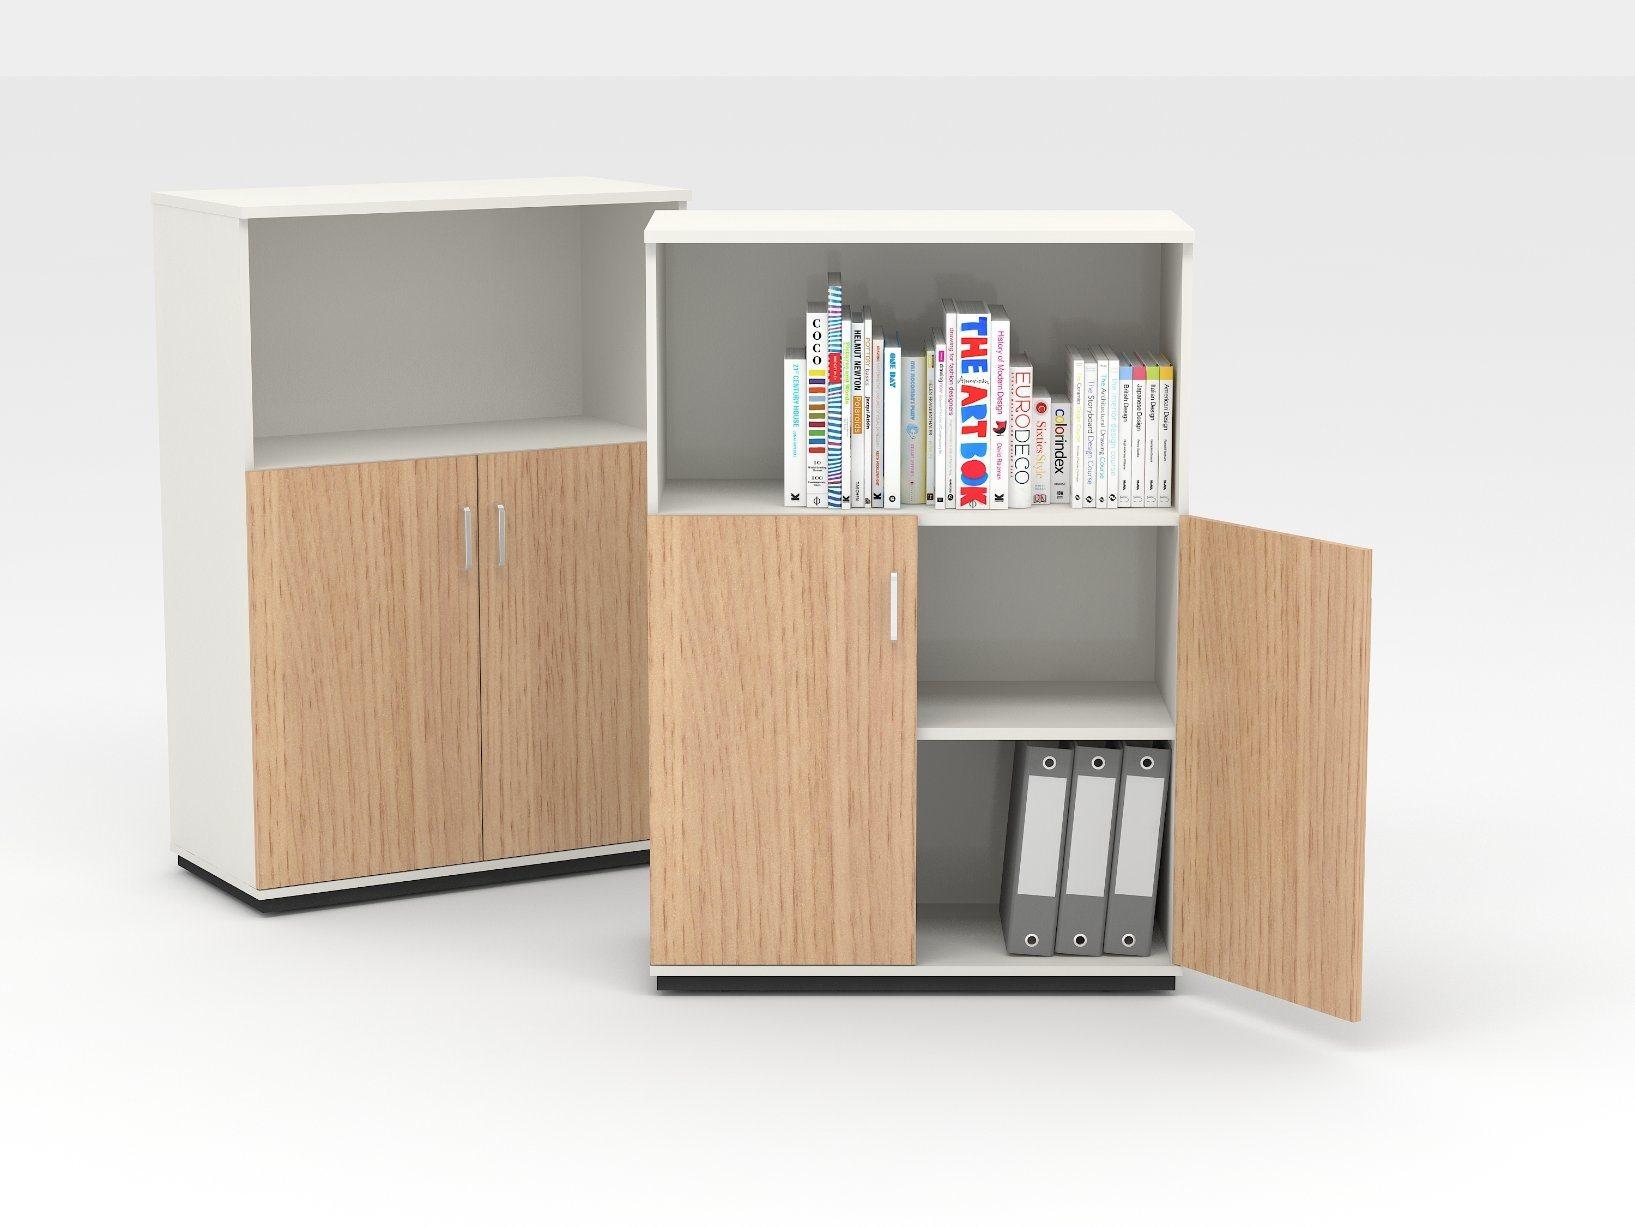 wooden office storage. China 2018 New Office Storage Cabinet Wooden Filing - File Cabinet, Cabinets A